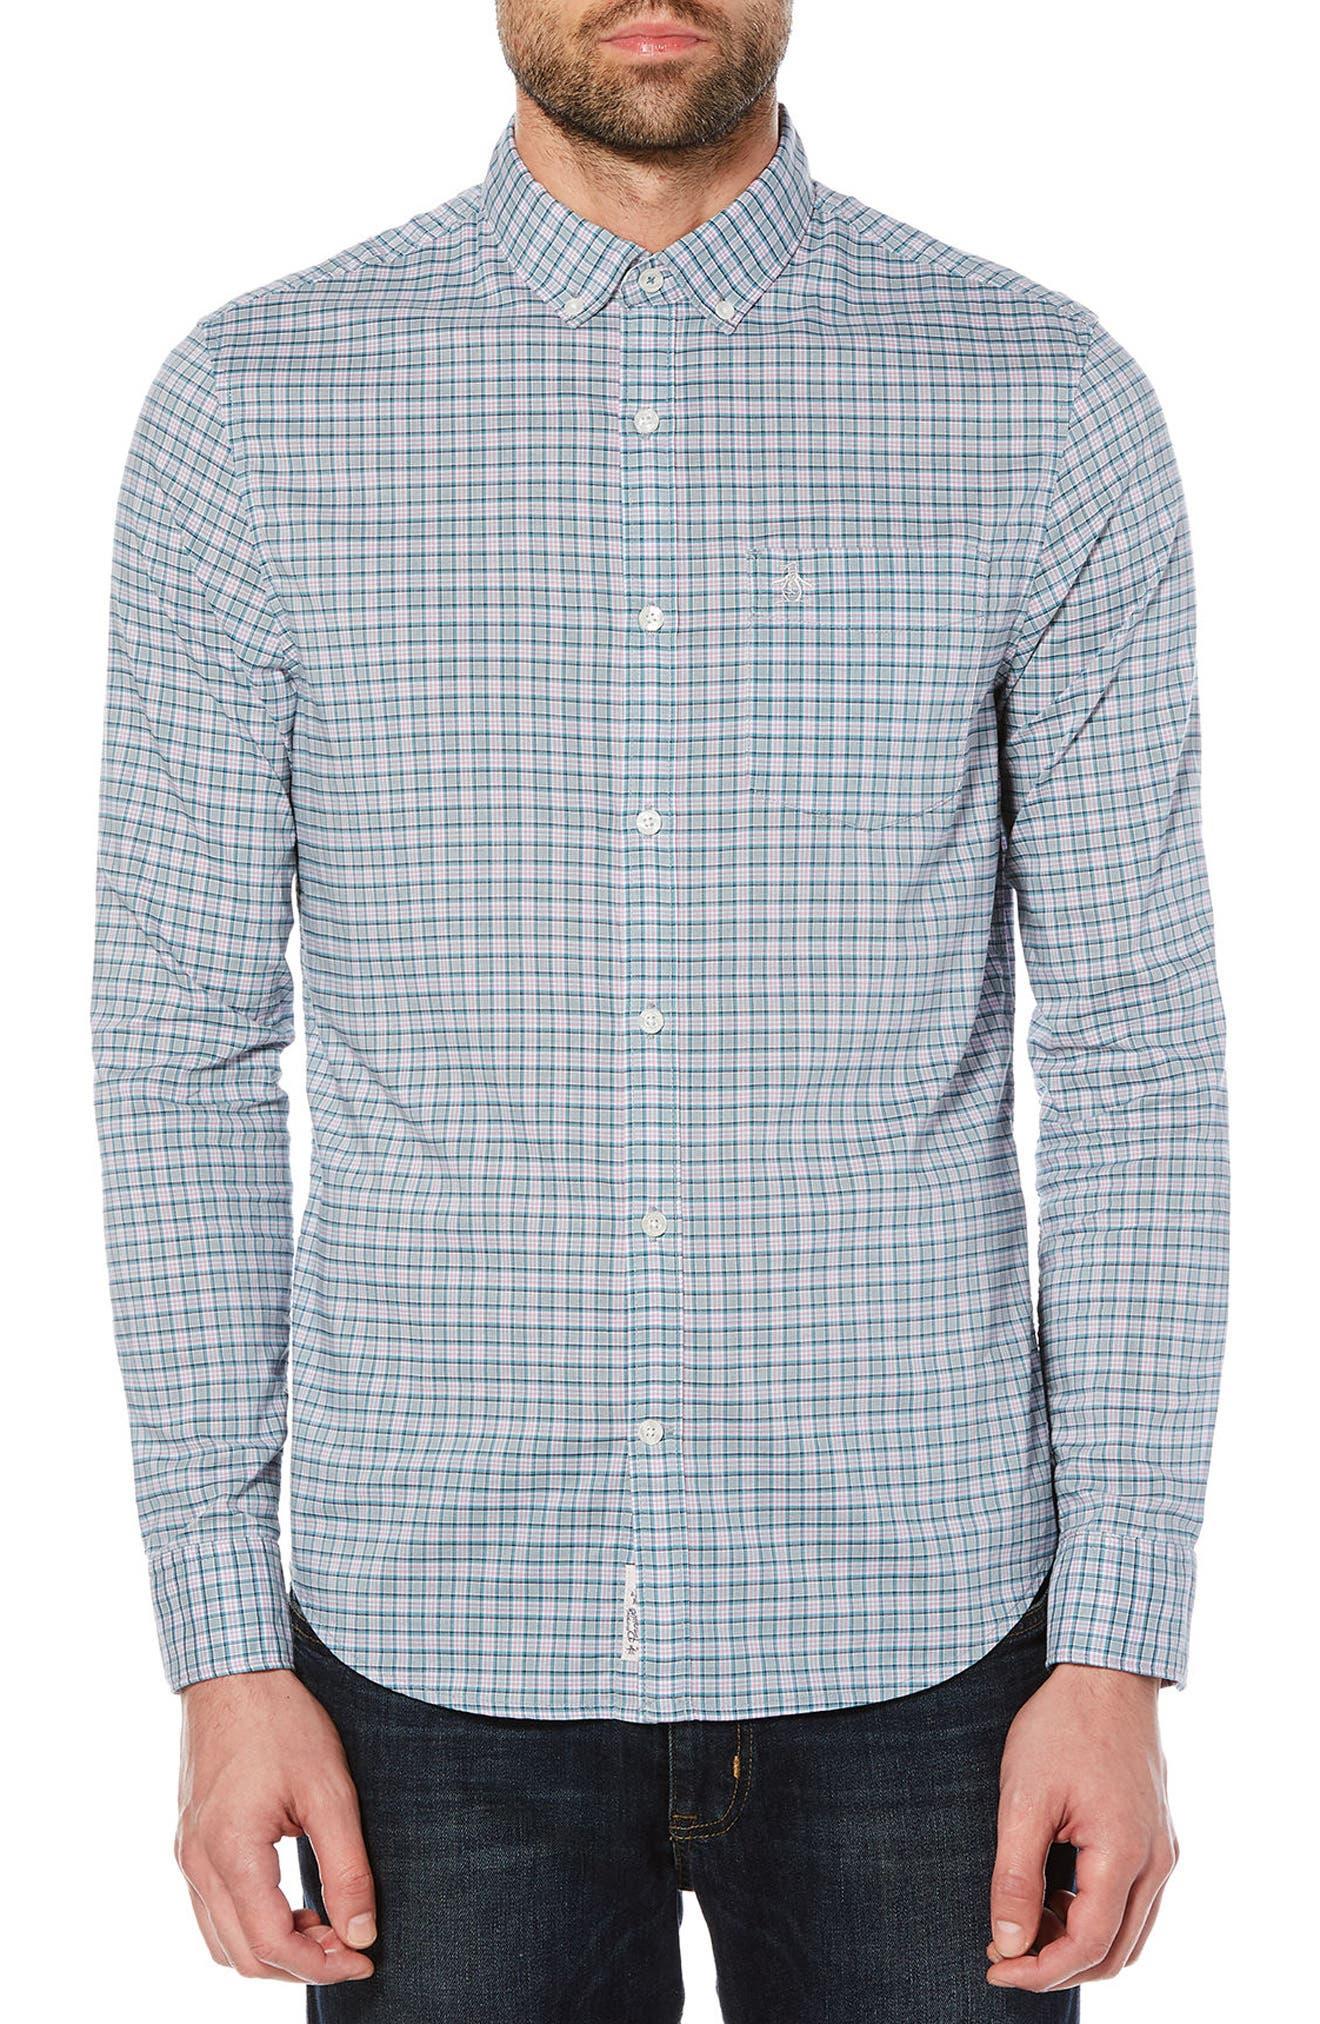 P55 Stretch Shirt,                             Main thumbnail 1, color,                             051